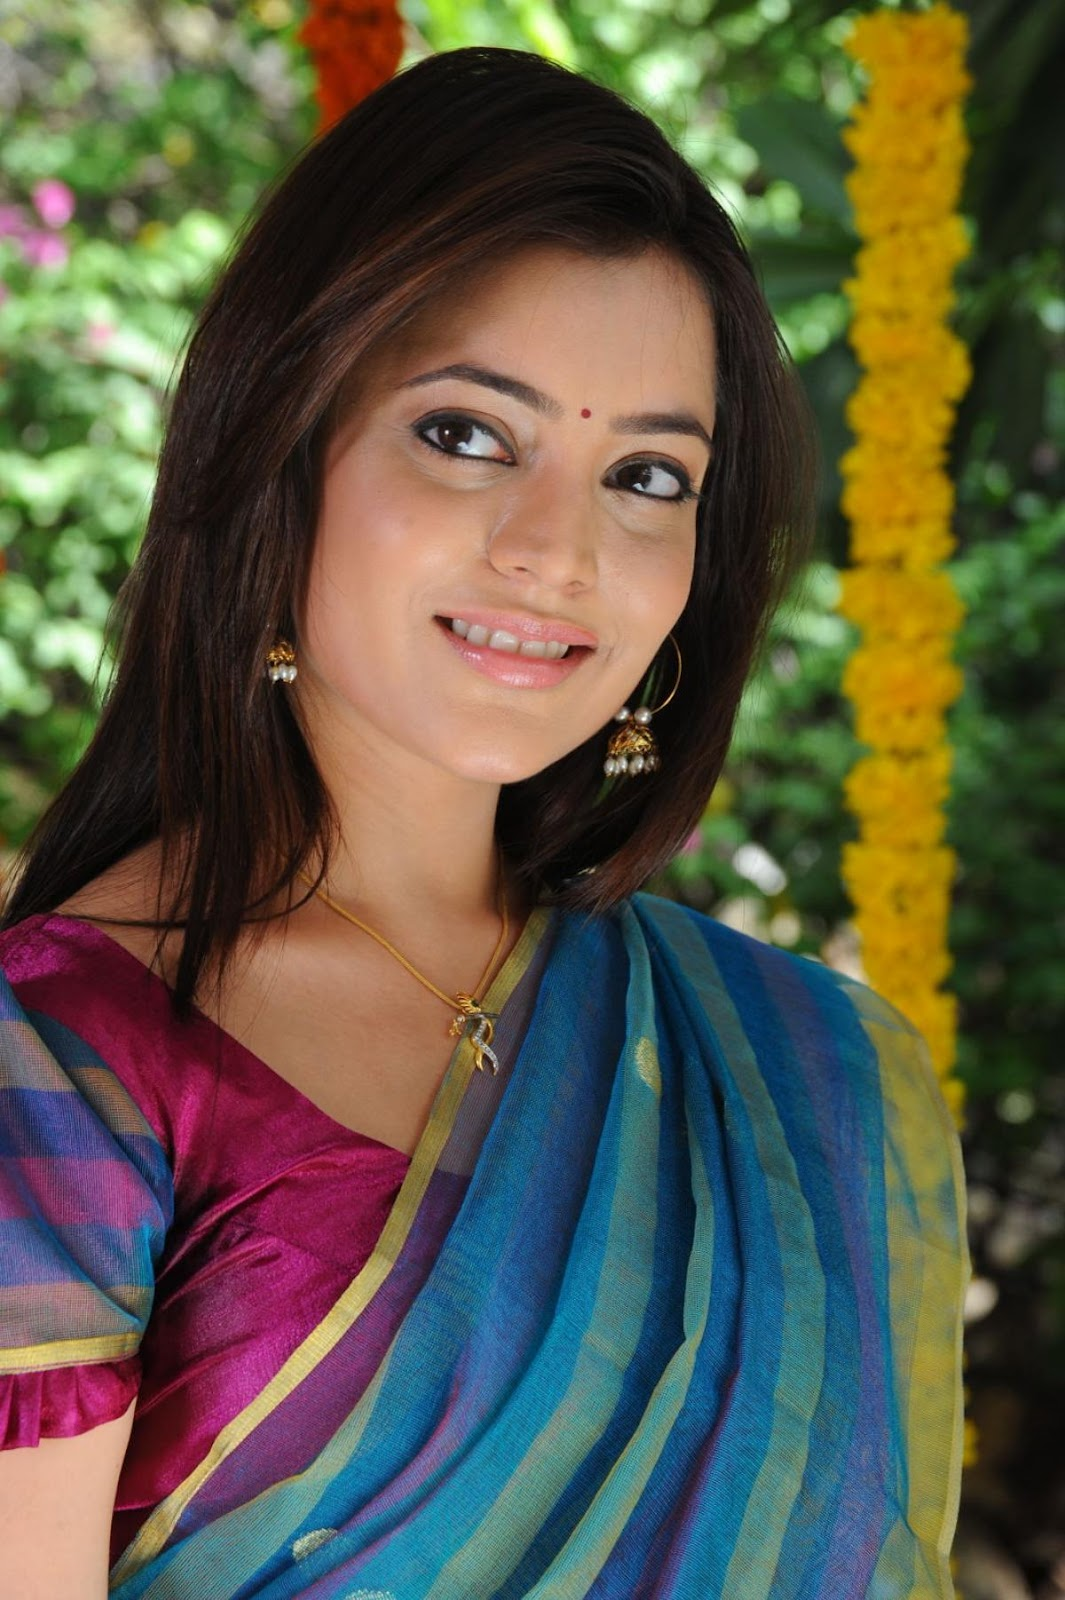 Nisha agarwal saree face photos